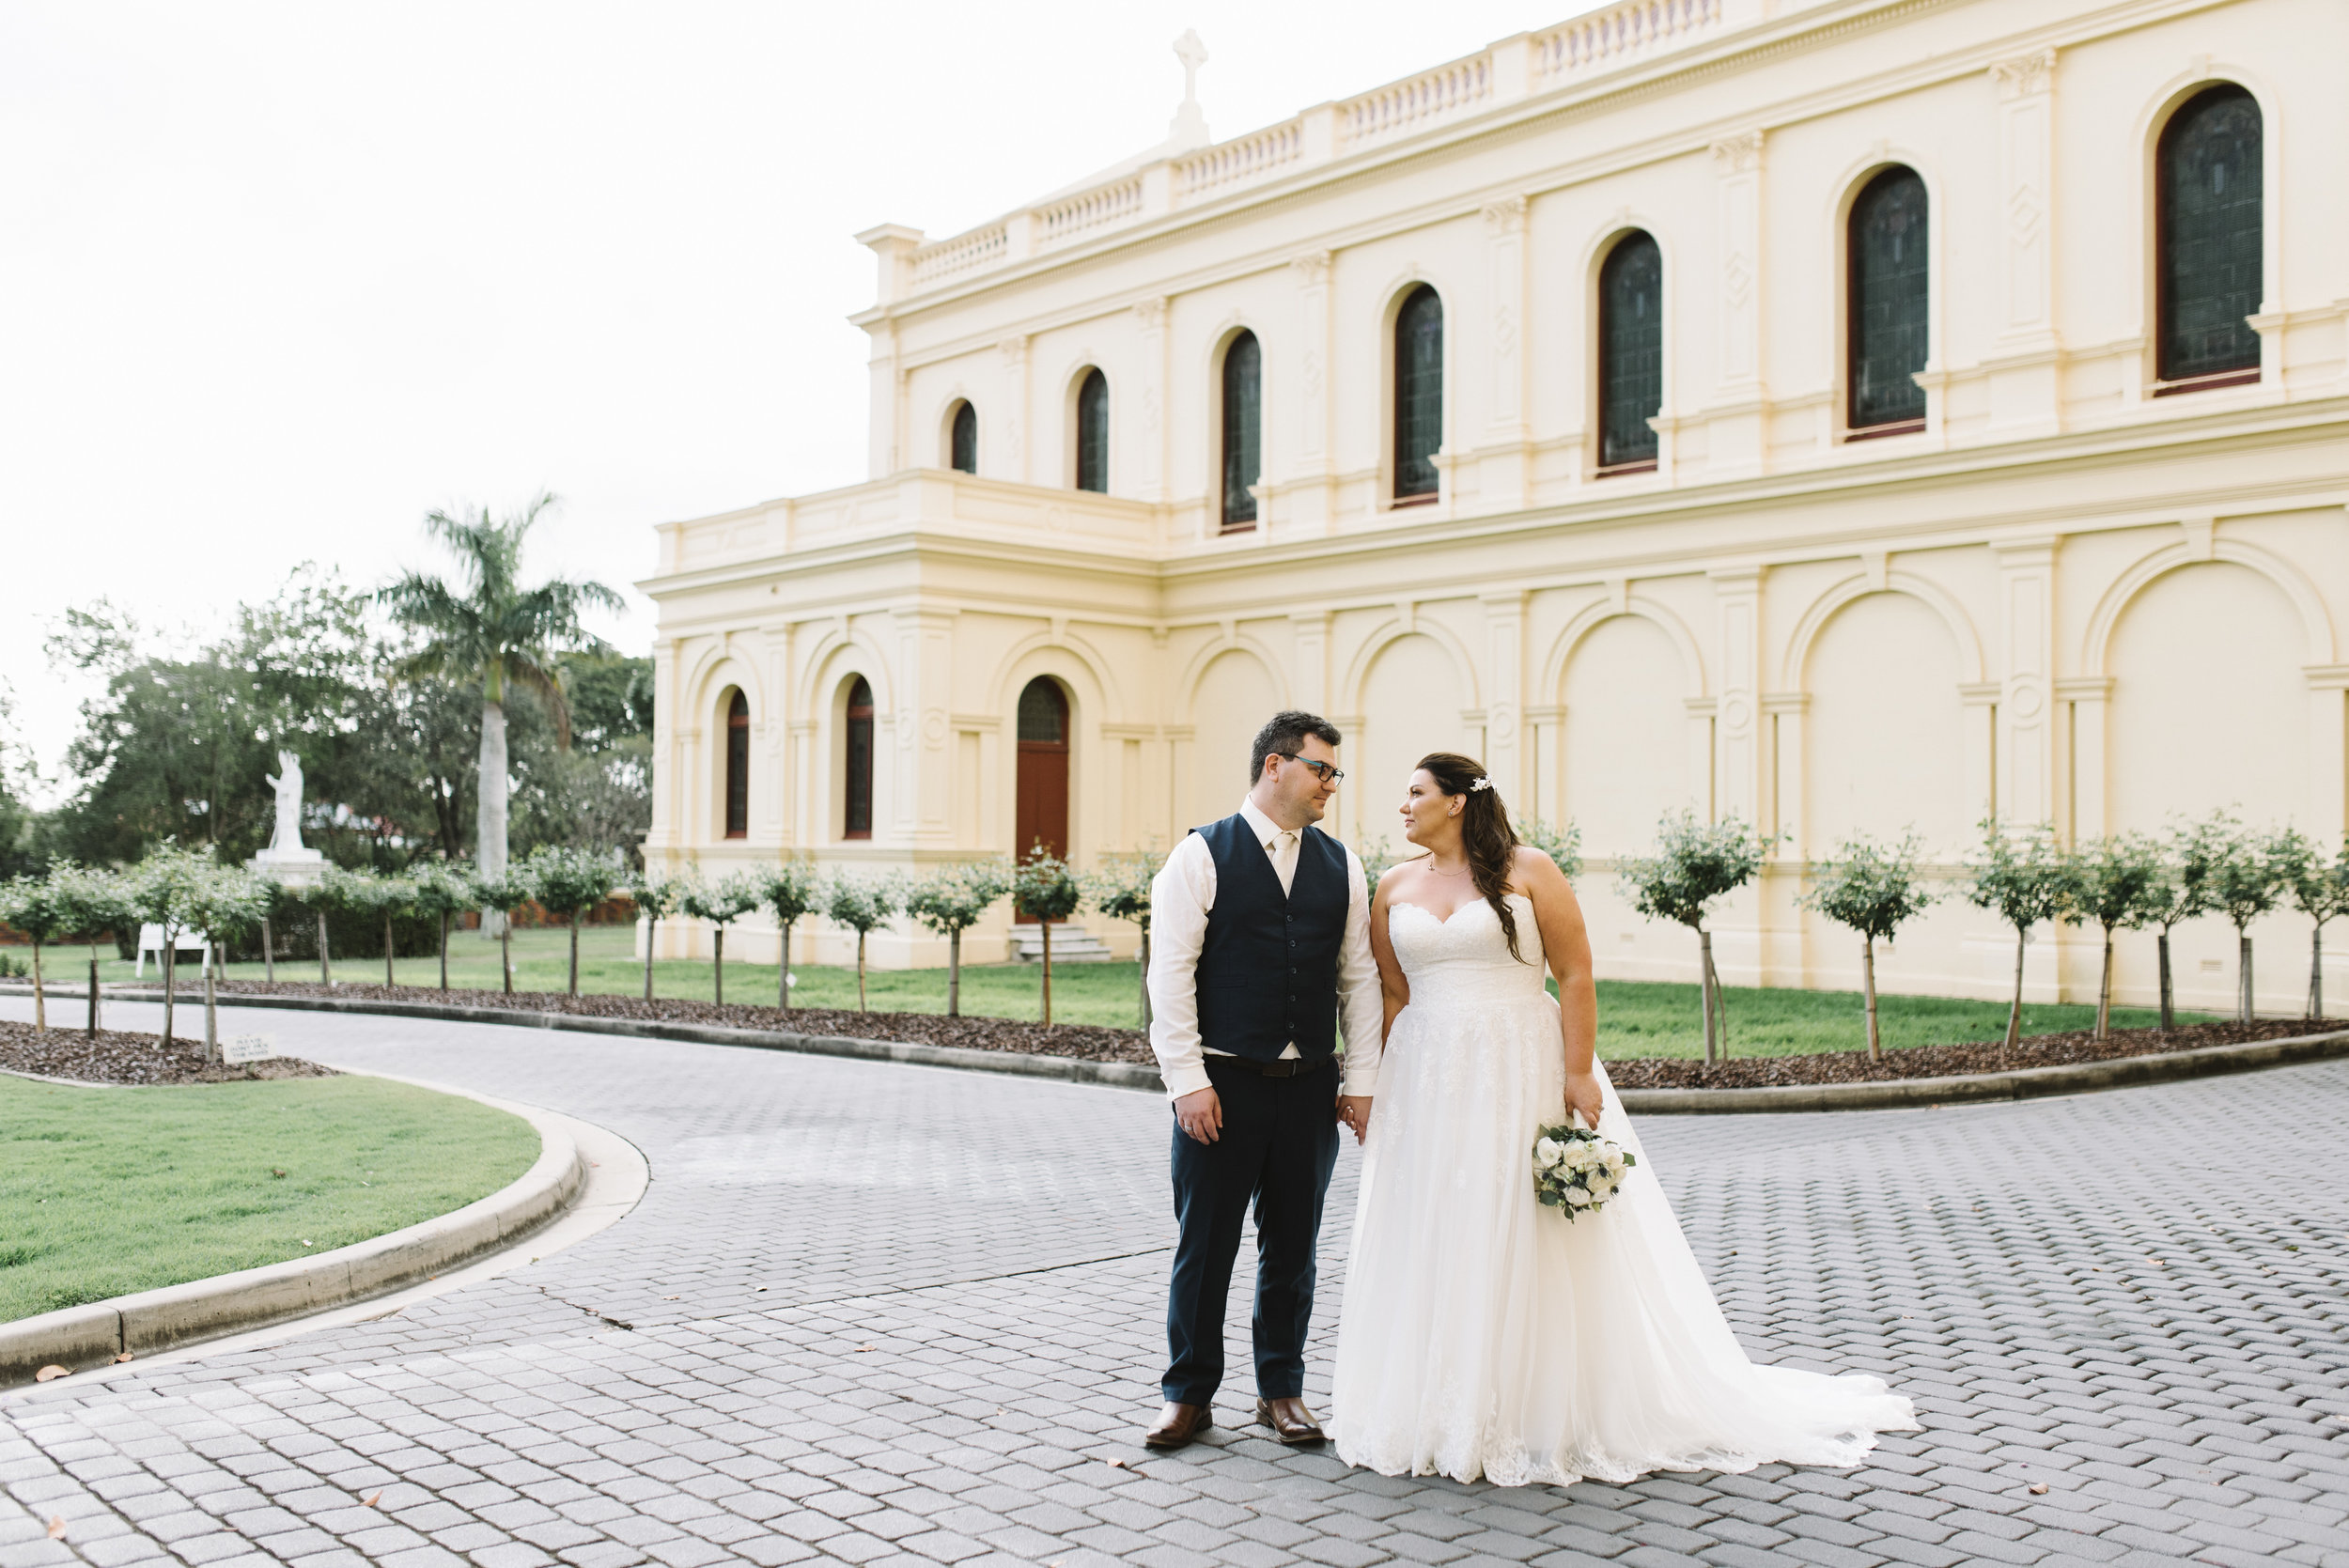 brisbane-wedding-photographer-73.jpg